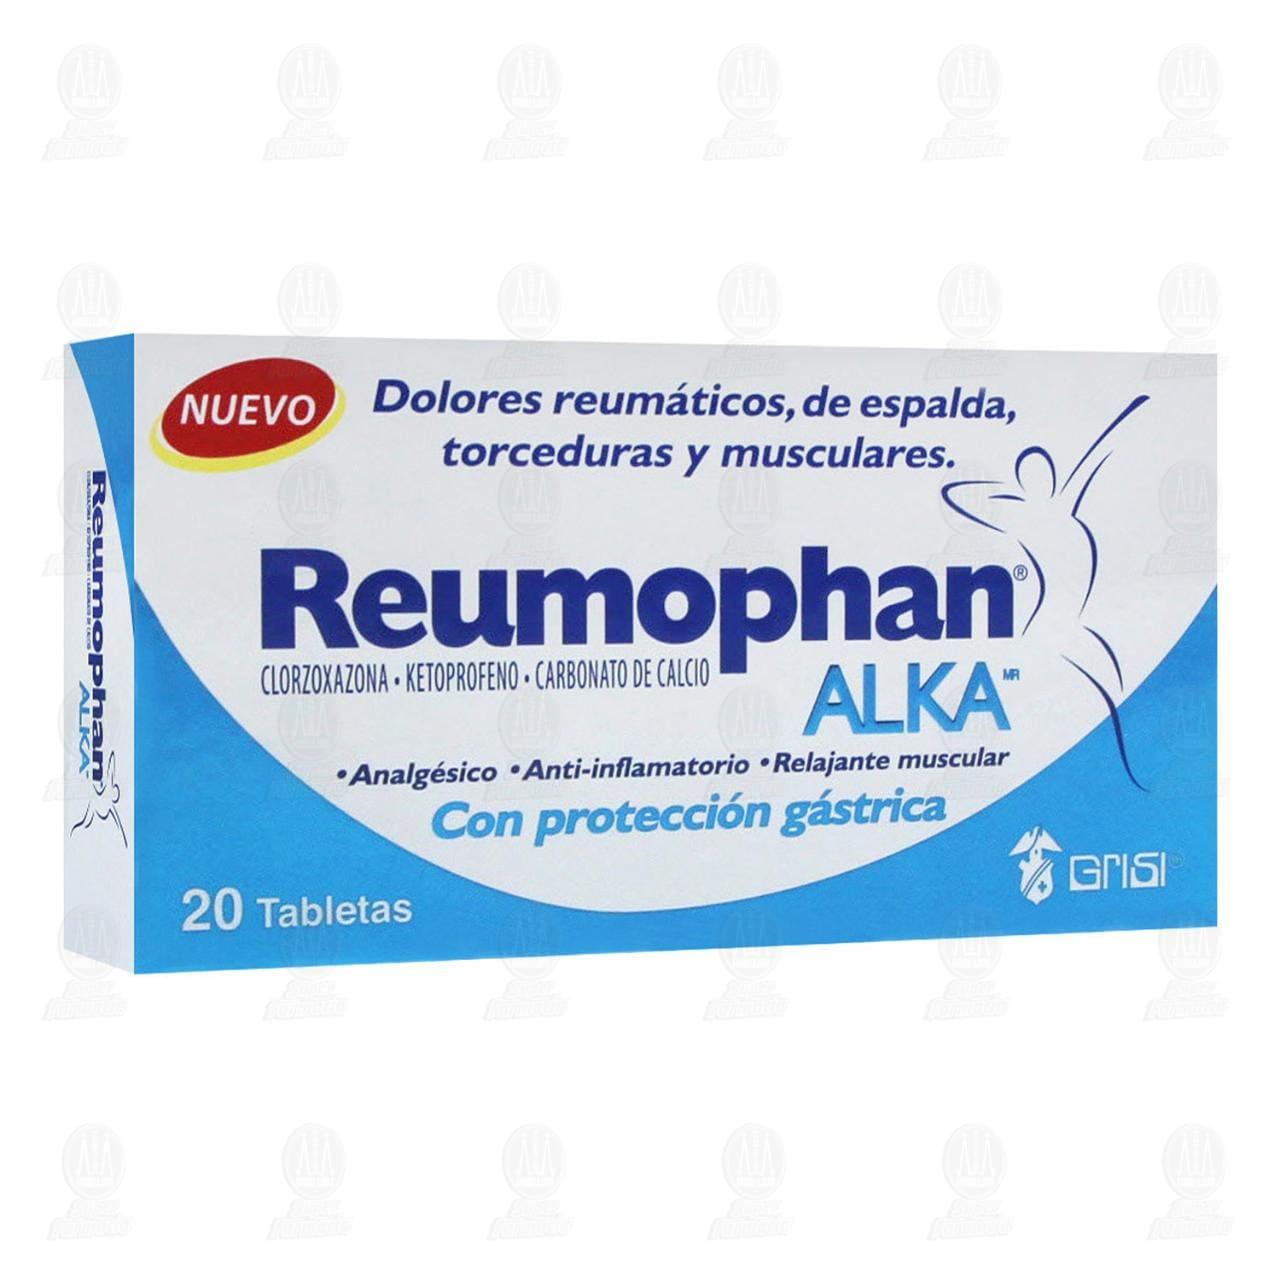 Reumophan Alka 20 Tabletas